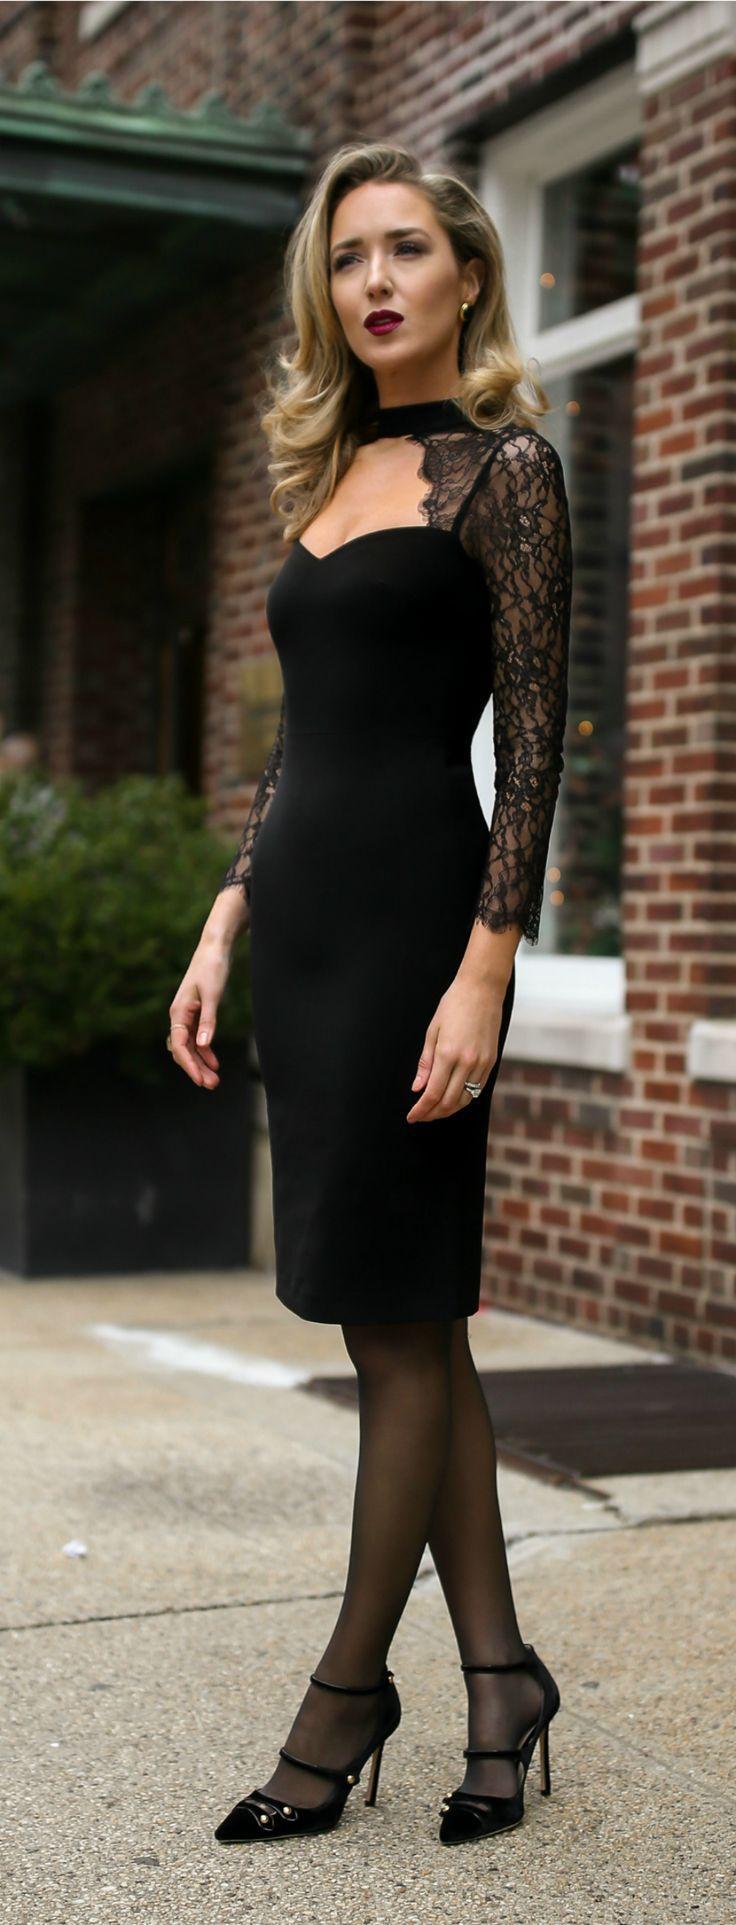 dresses in days date night black lace cutout sheath dress